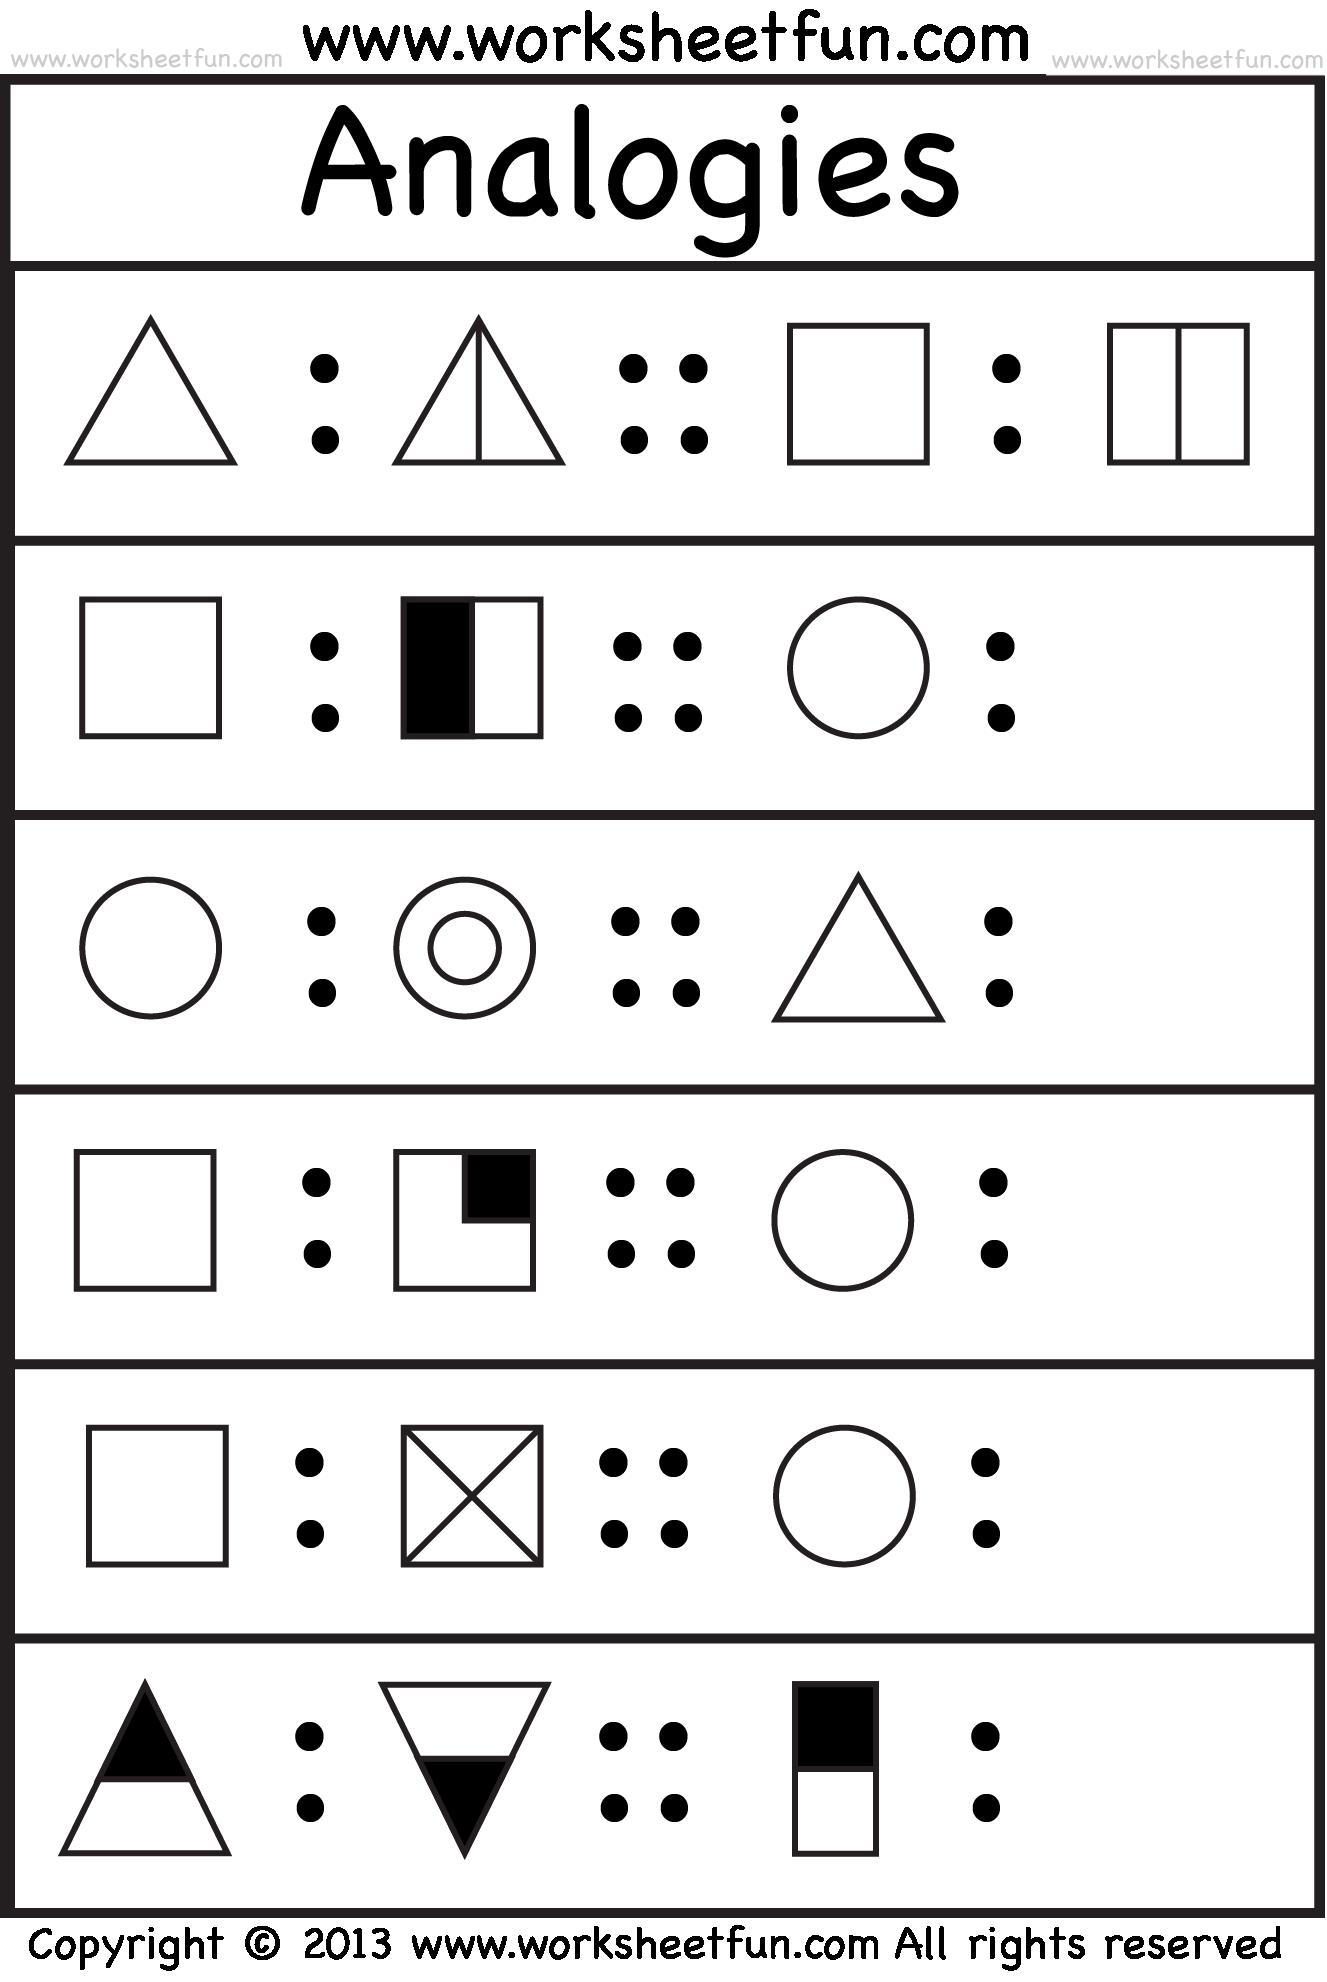 medium resolution of picture_analogies_wfun_2.png 1